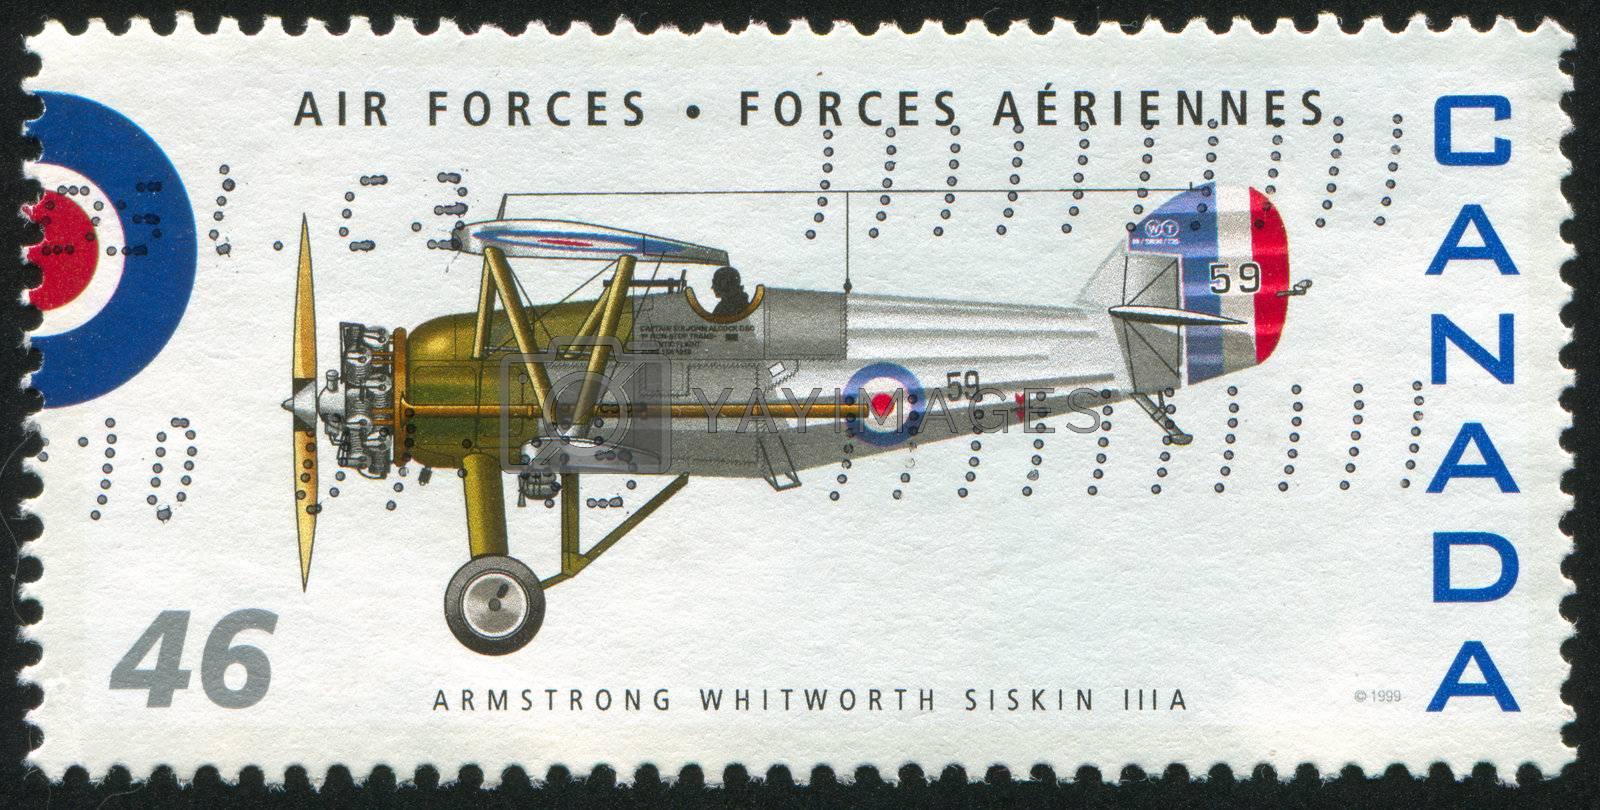 CANADA - CIRCA 1999: stamp printed by Canada, shows aeroplane, Armstrong Whitworth Siskin IIIA, circa 1999